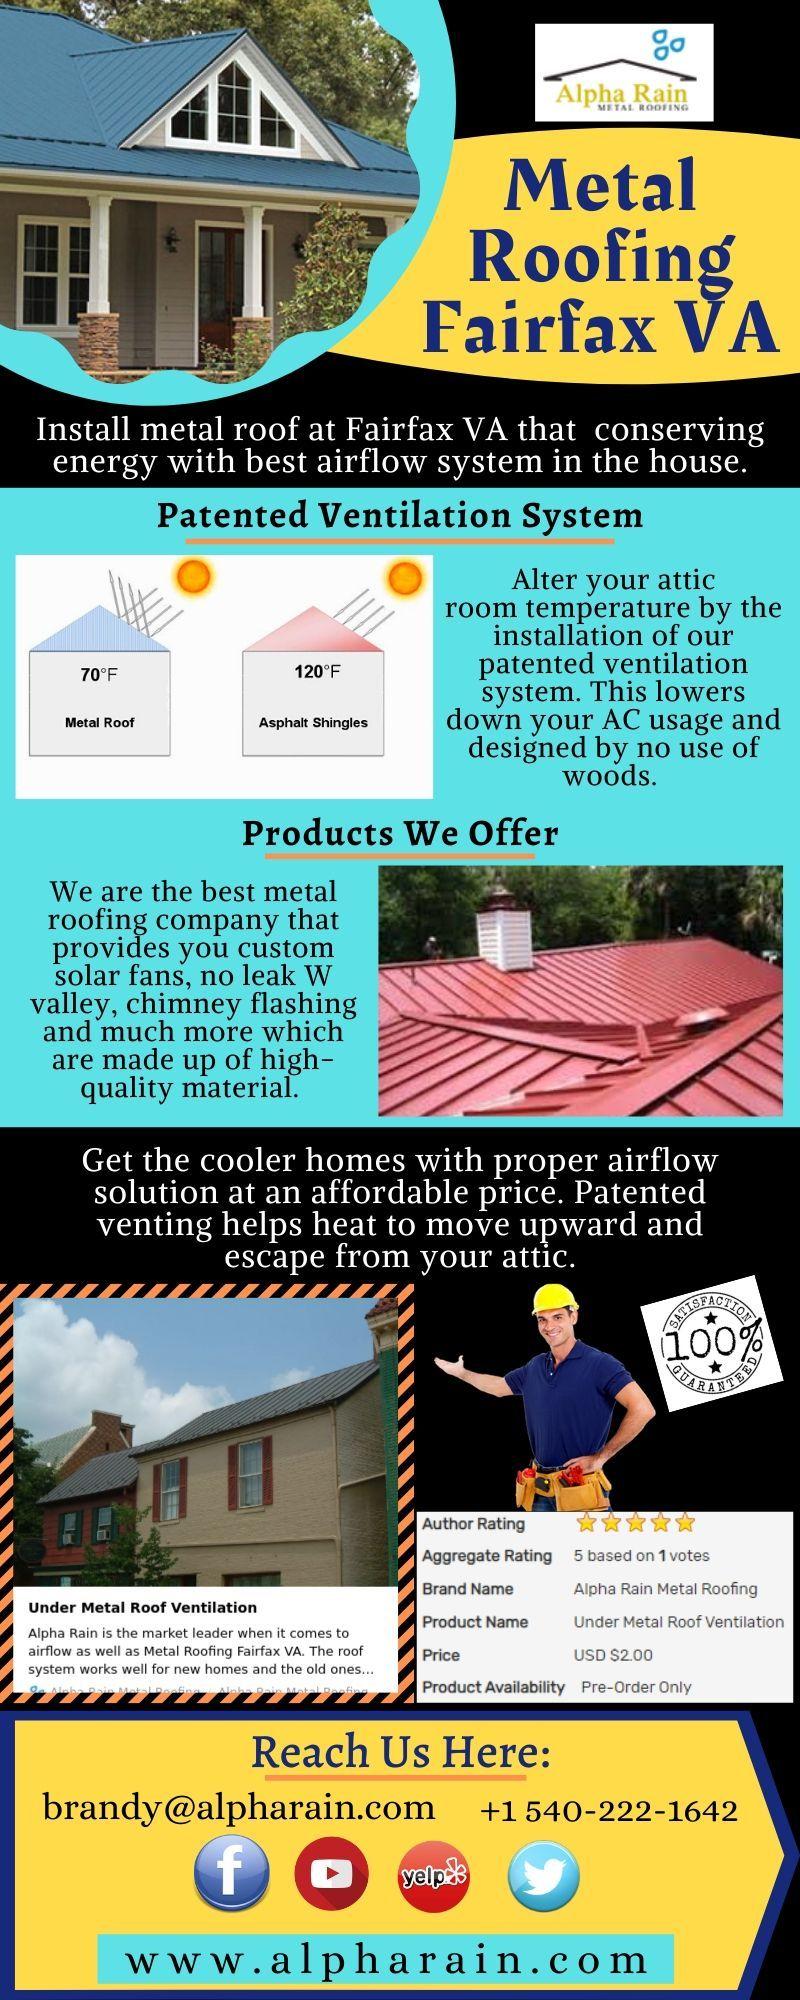 Under Metal Roof Ventilation In 2020 Roofing Roofing Companies Metal Roof